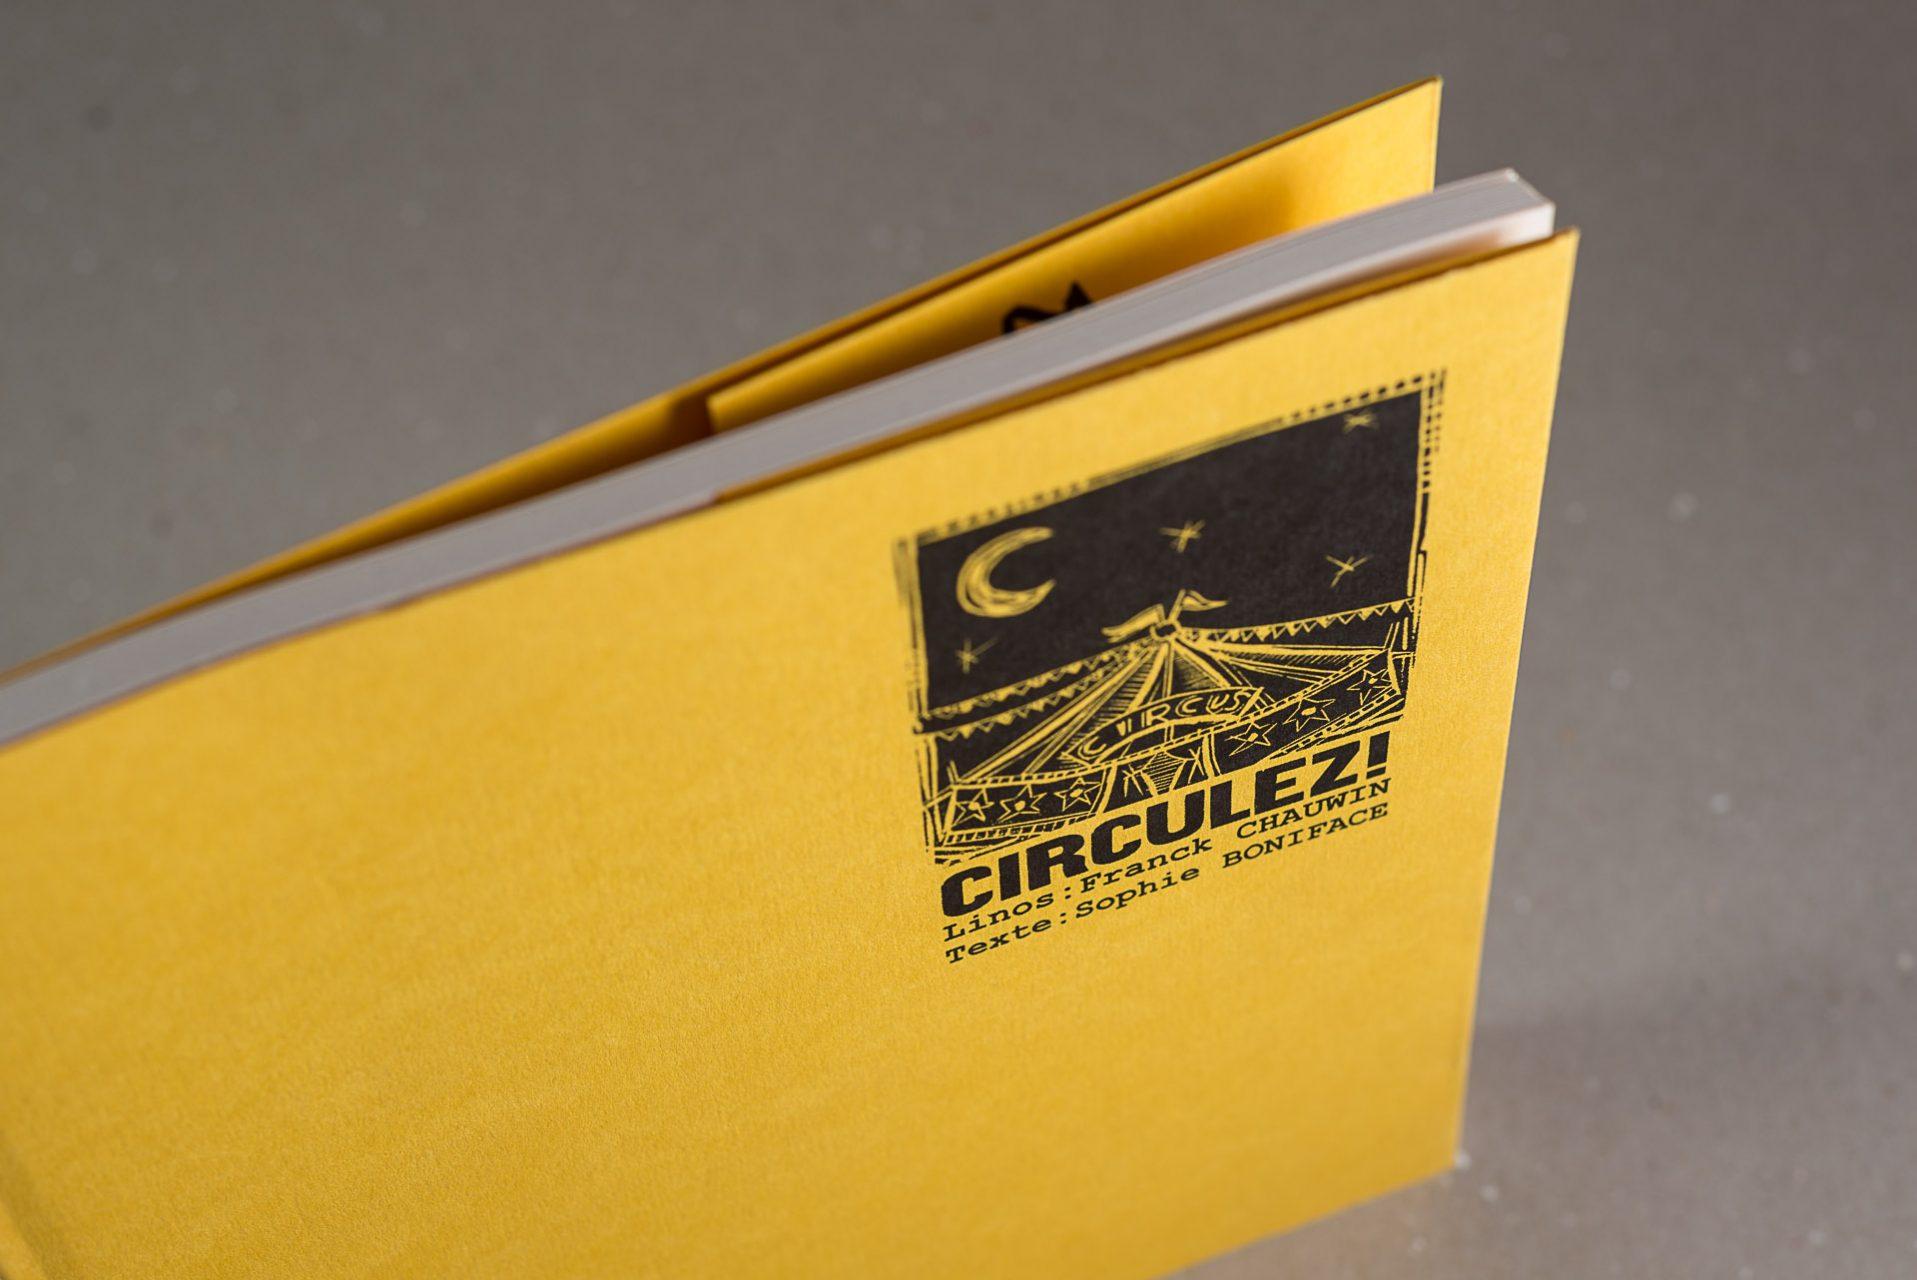 web-hd-nuit-myrtide-livre-circulez-chauwin-boniface-03